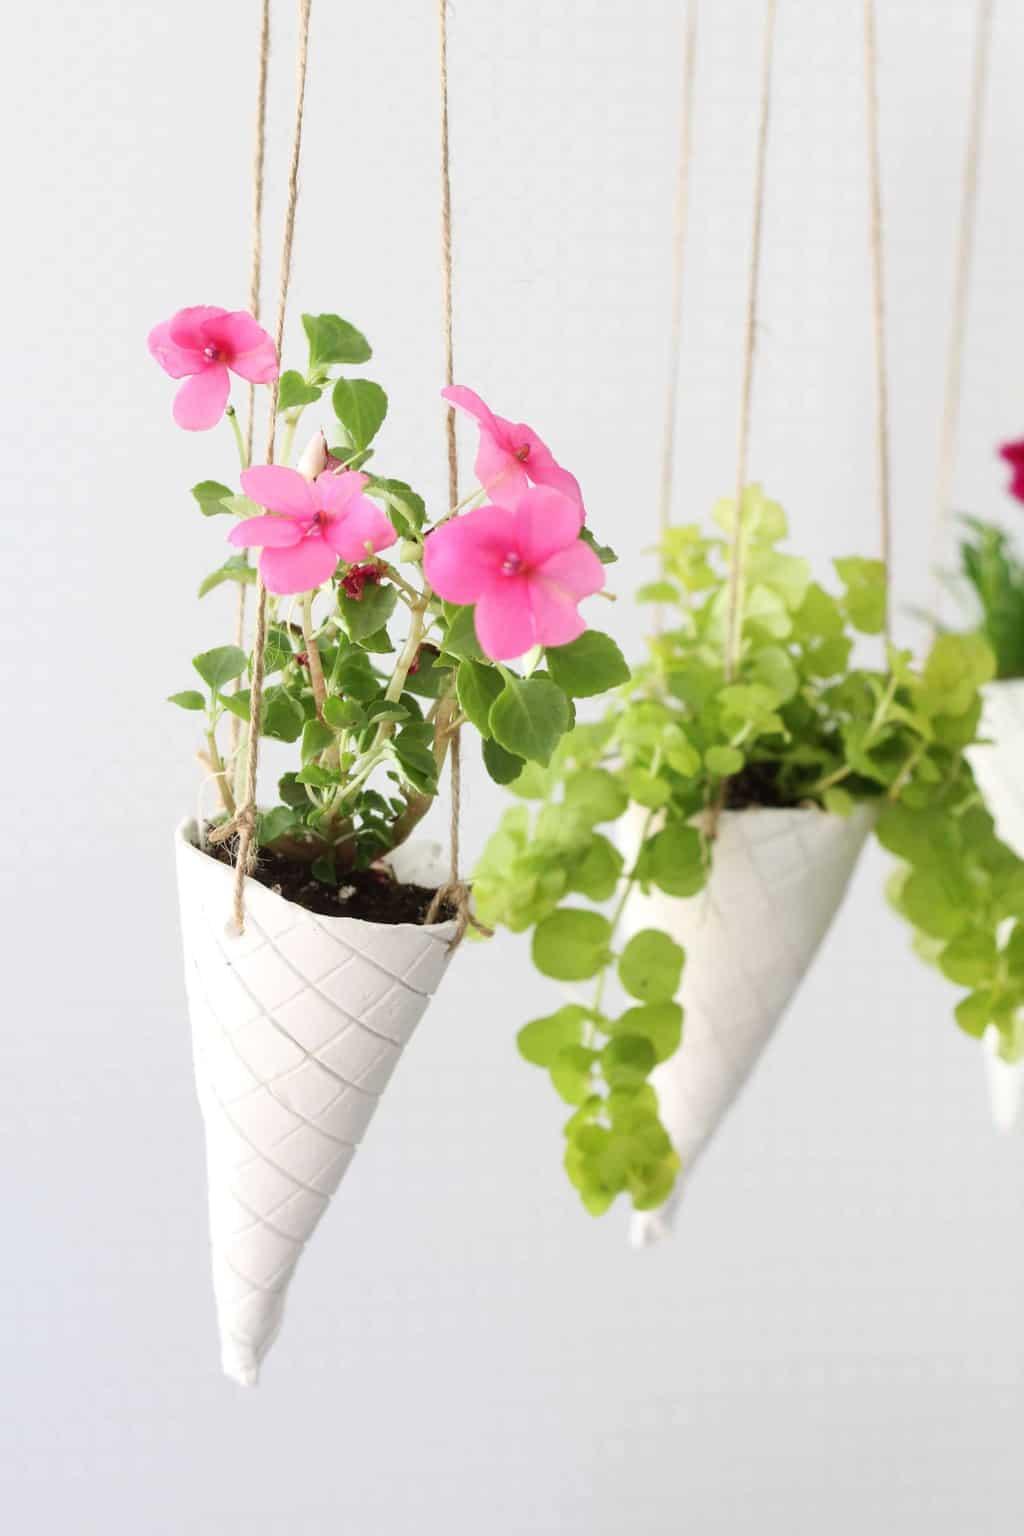 Ice Cream Cone DIY Hanging Planters HelloGlowco